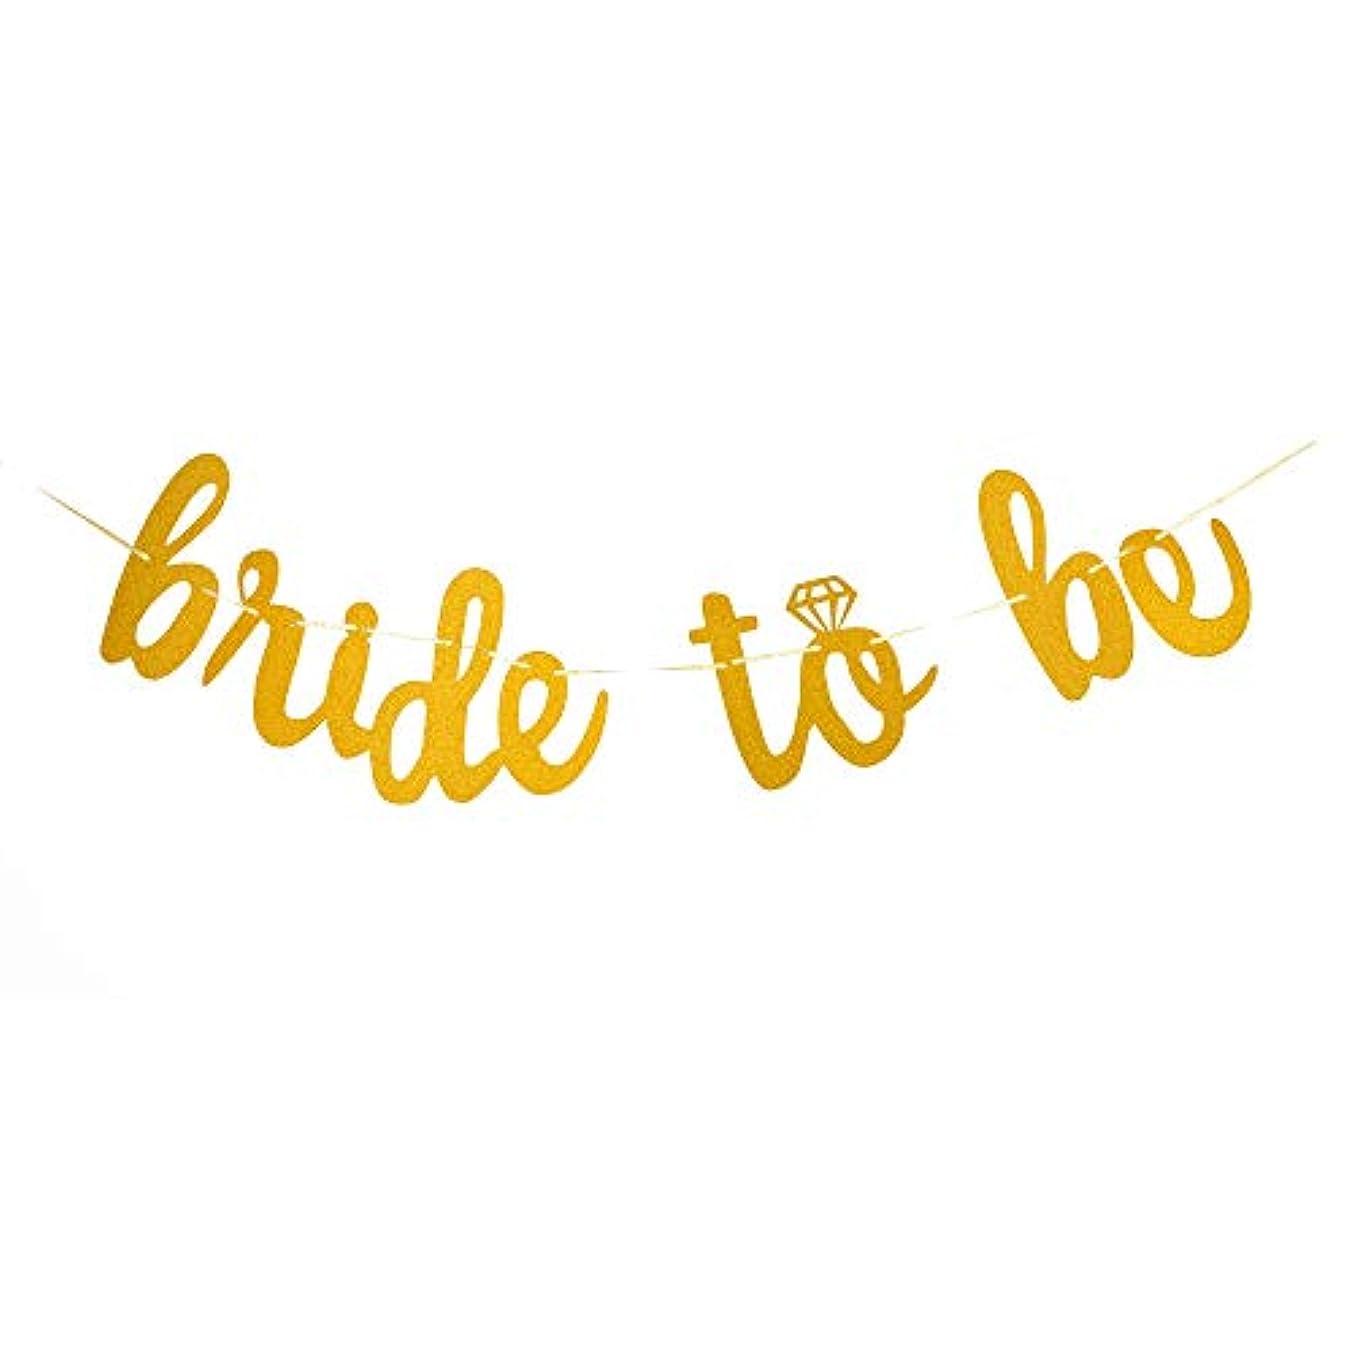 Bride to Be Banner, Gold Gliter Paper Sign for Bacherolette/Engagement/Bridal Shower/Wedding Party Decorations